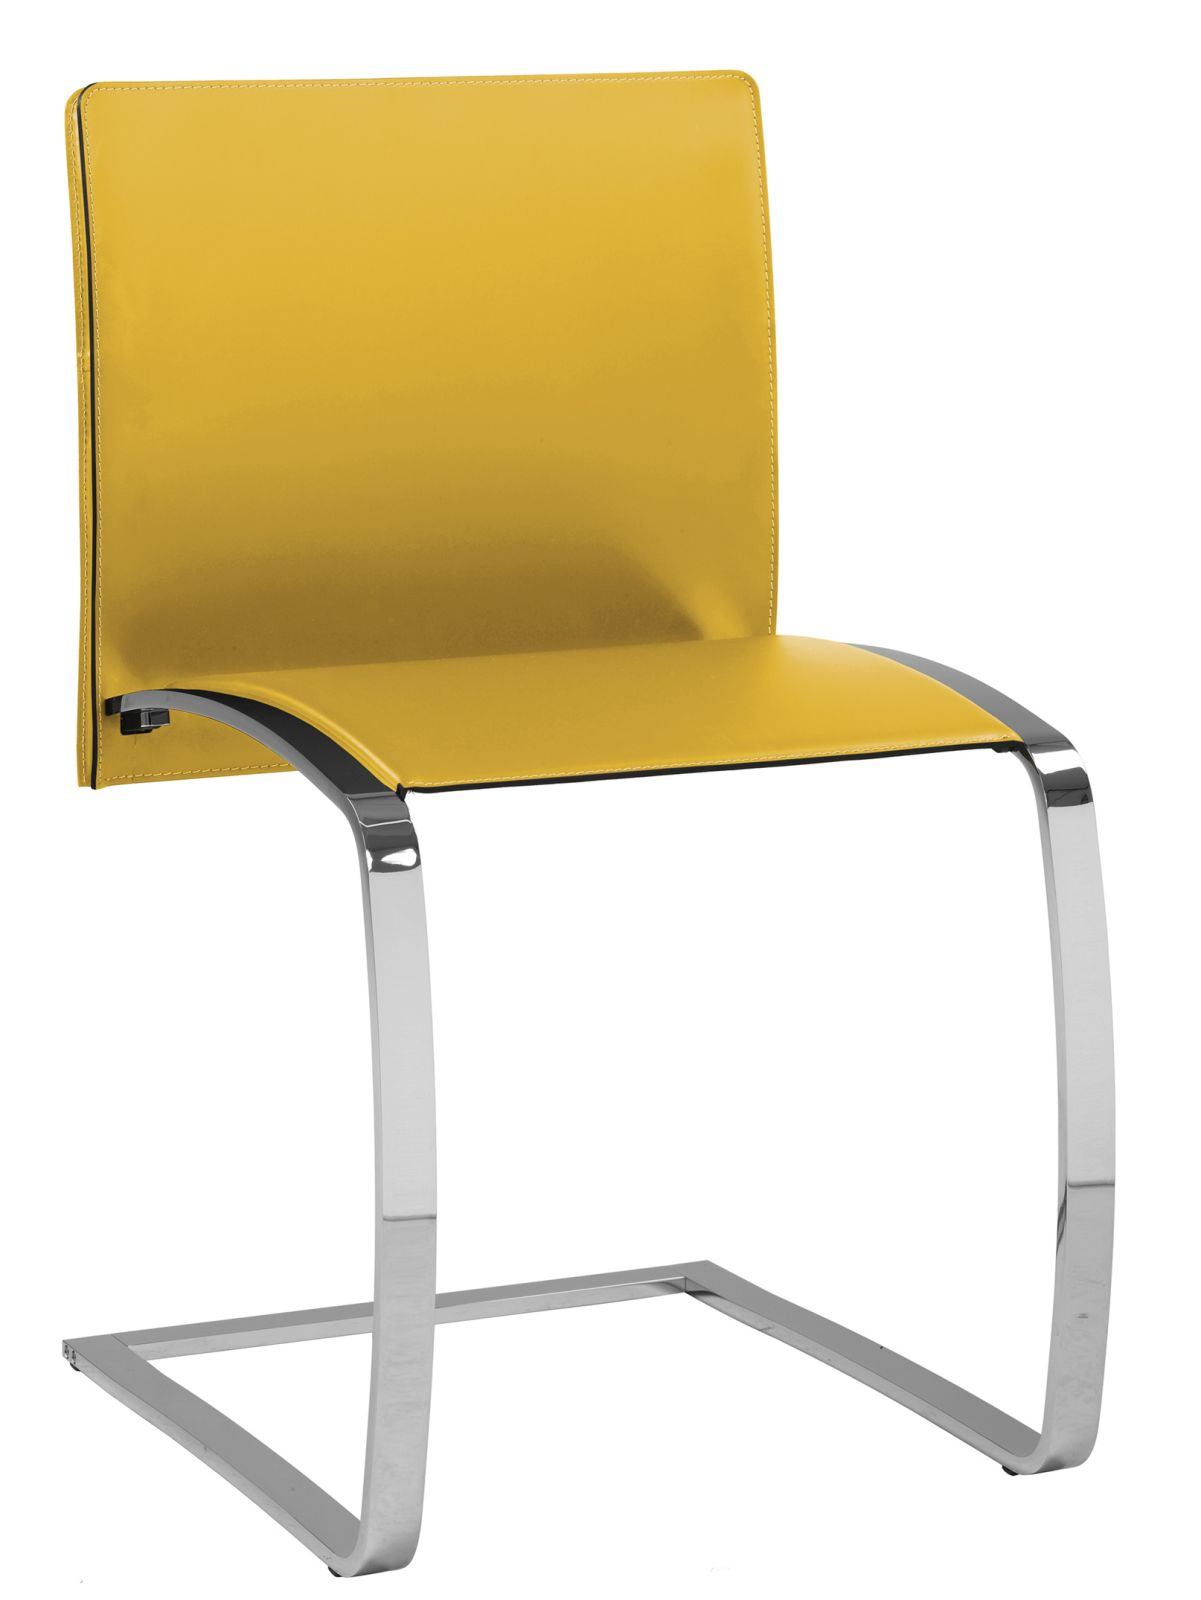 MDC 104 Modern Dining Chairs